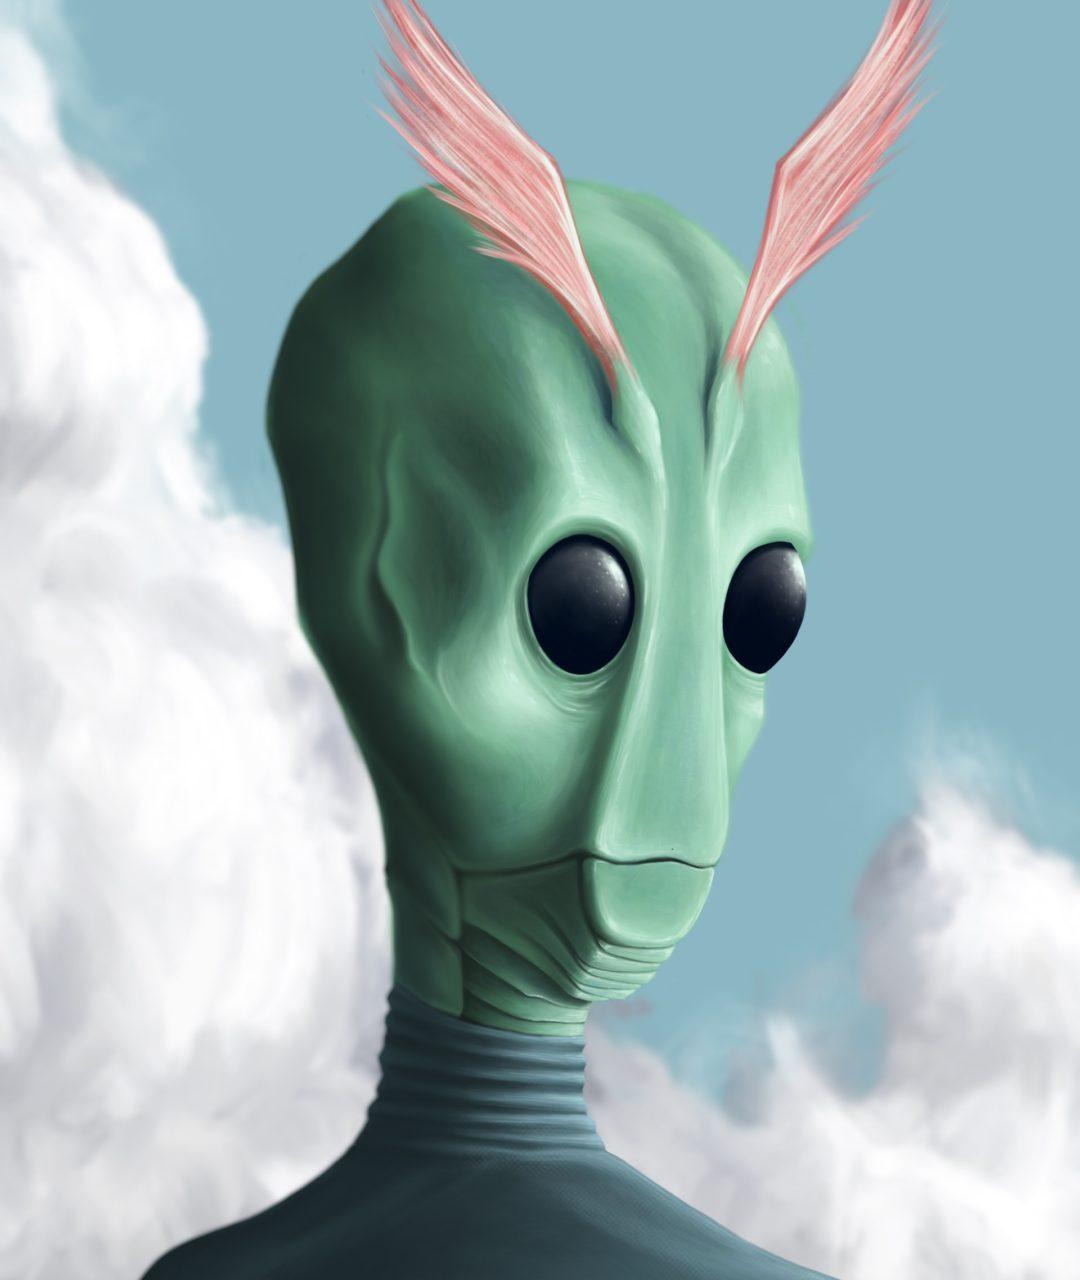 alien_portrait